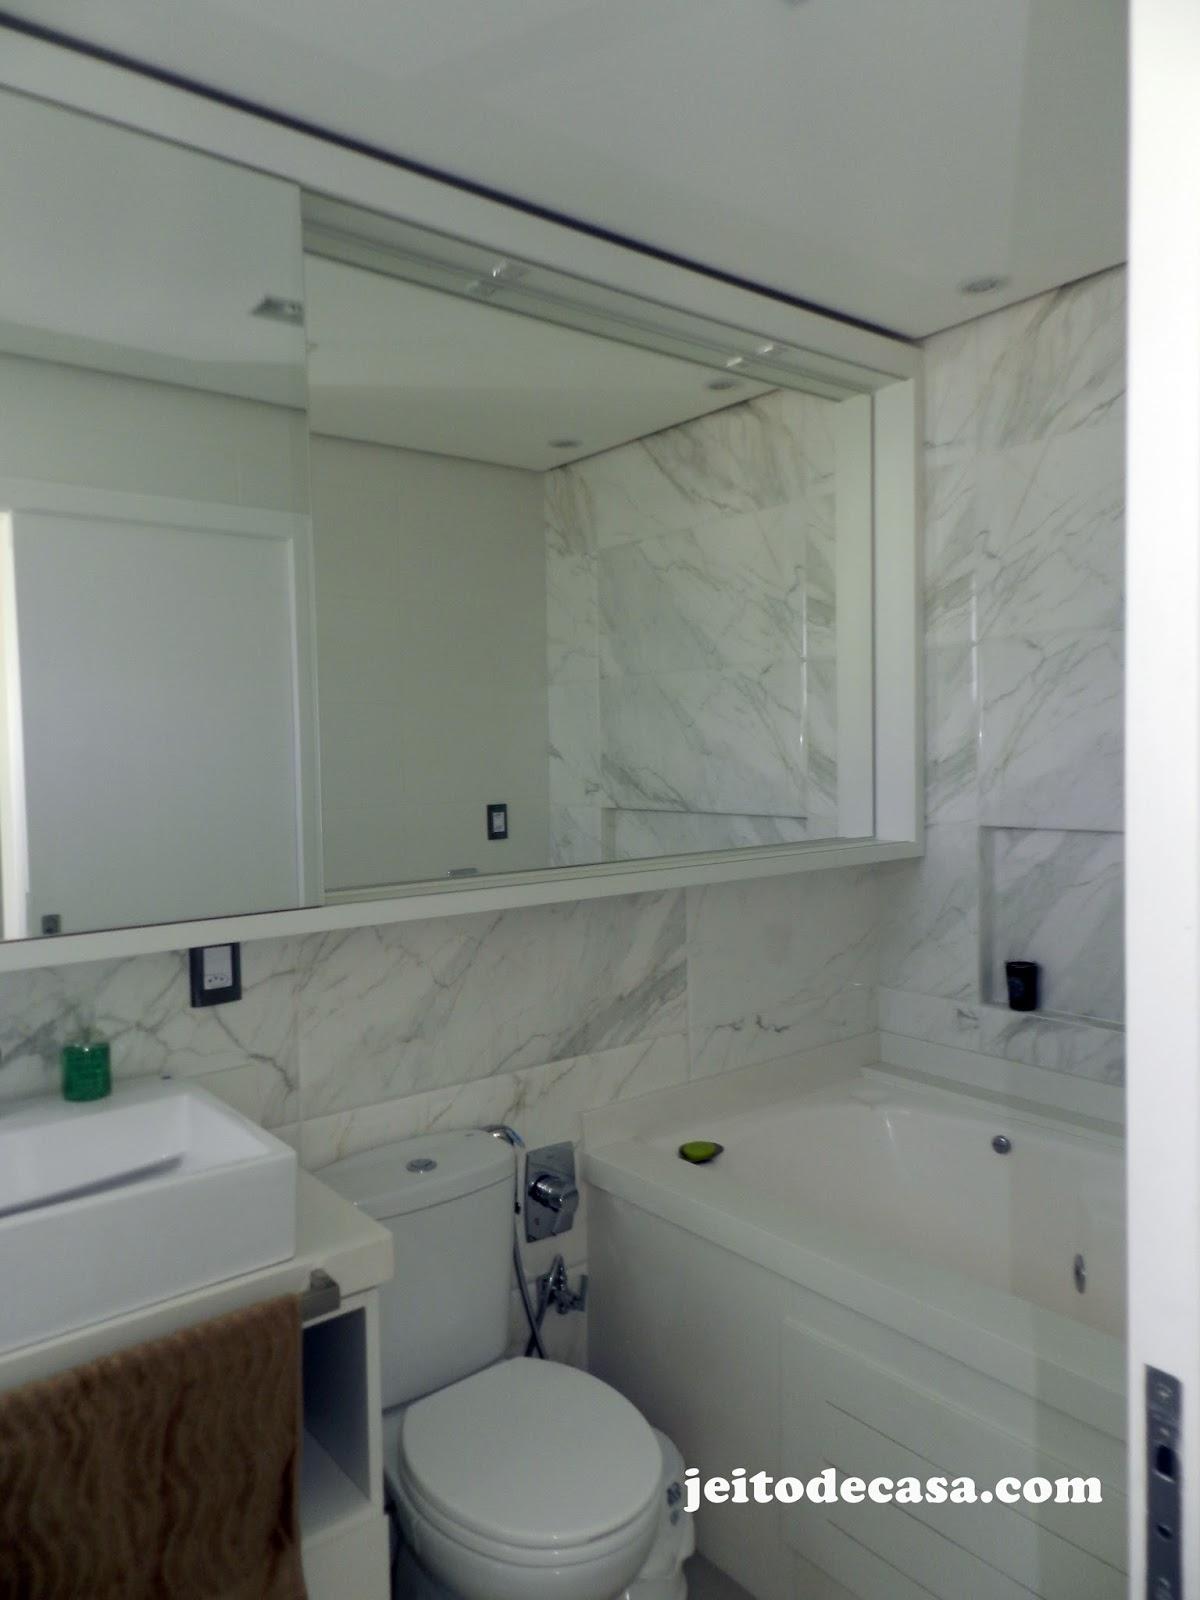 banheiro casal #4A5059 1200x1600 Banheiro Casal Suite